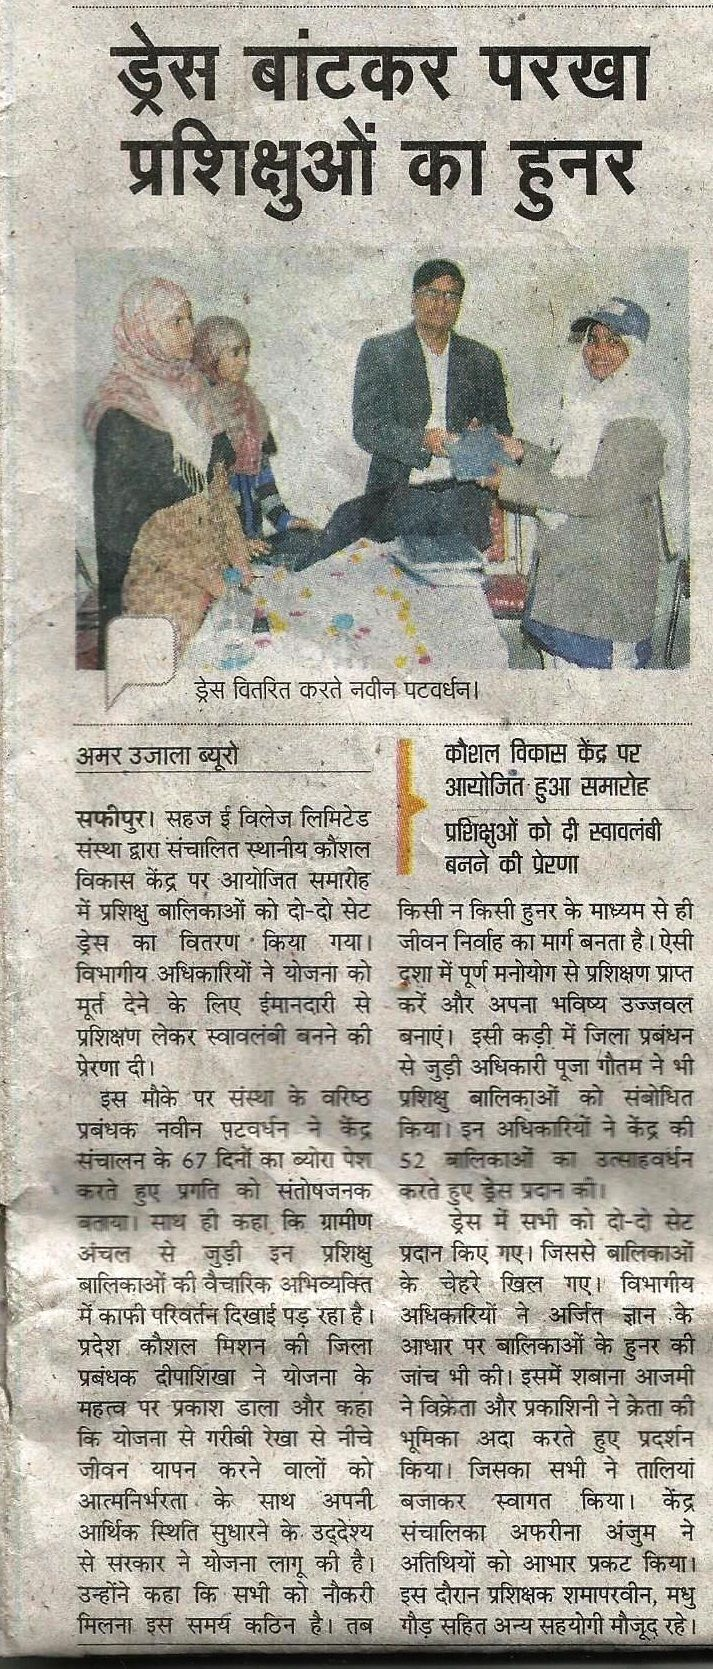 Sri Navin V Pathwardhan, Senior Manager,#Sahaj e-Village Ltd, Uttar Pradesh, distributed dresses to #students undergoing training at an event organized at Kaushal Vikas Kendra in #Safipur town at the Unnao district in #UttarPradesh. News coverage in various local media.